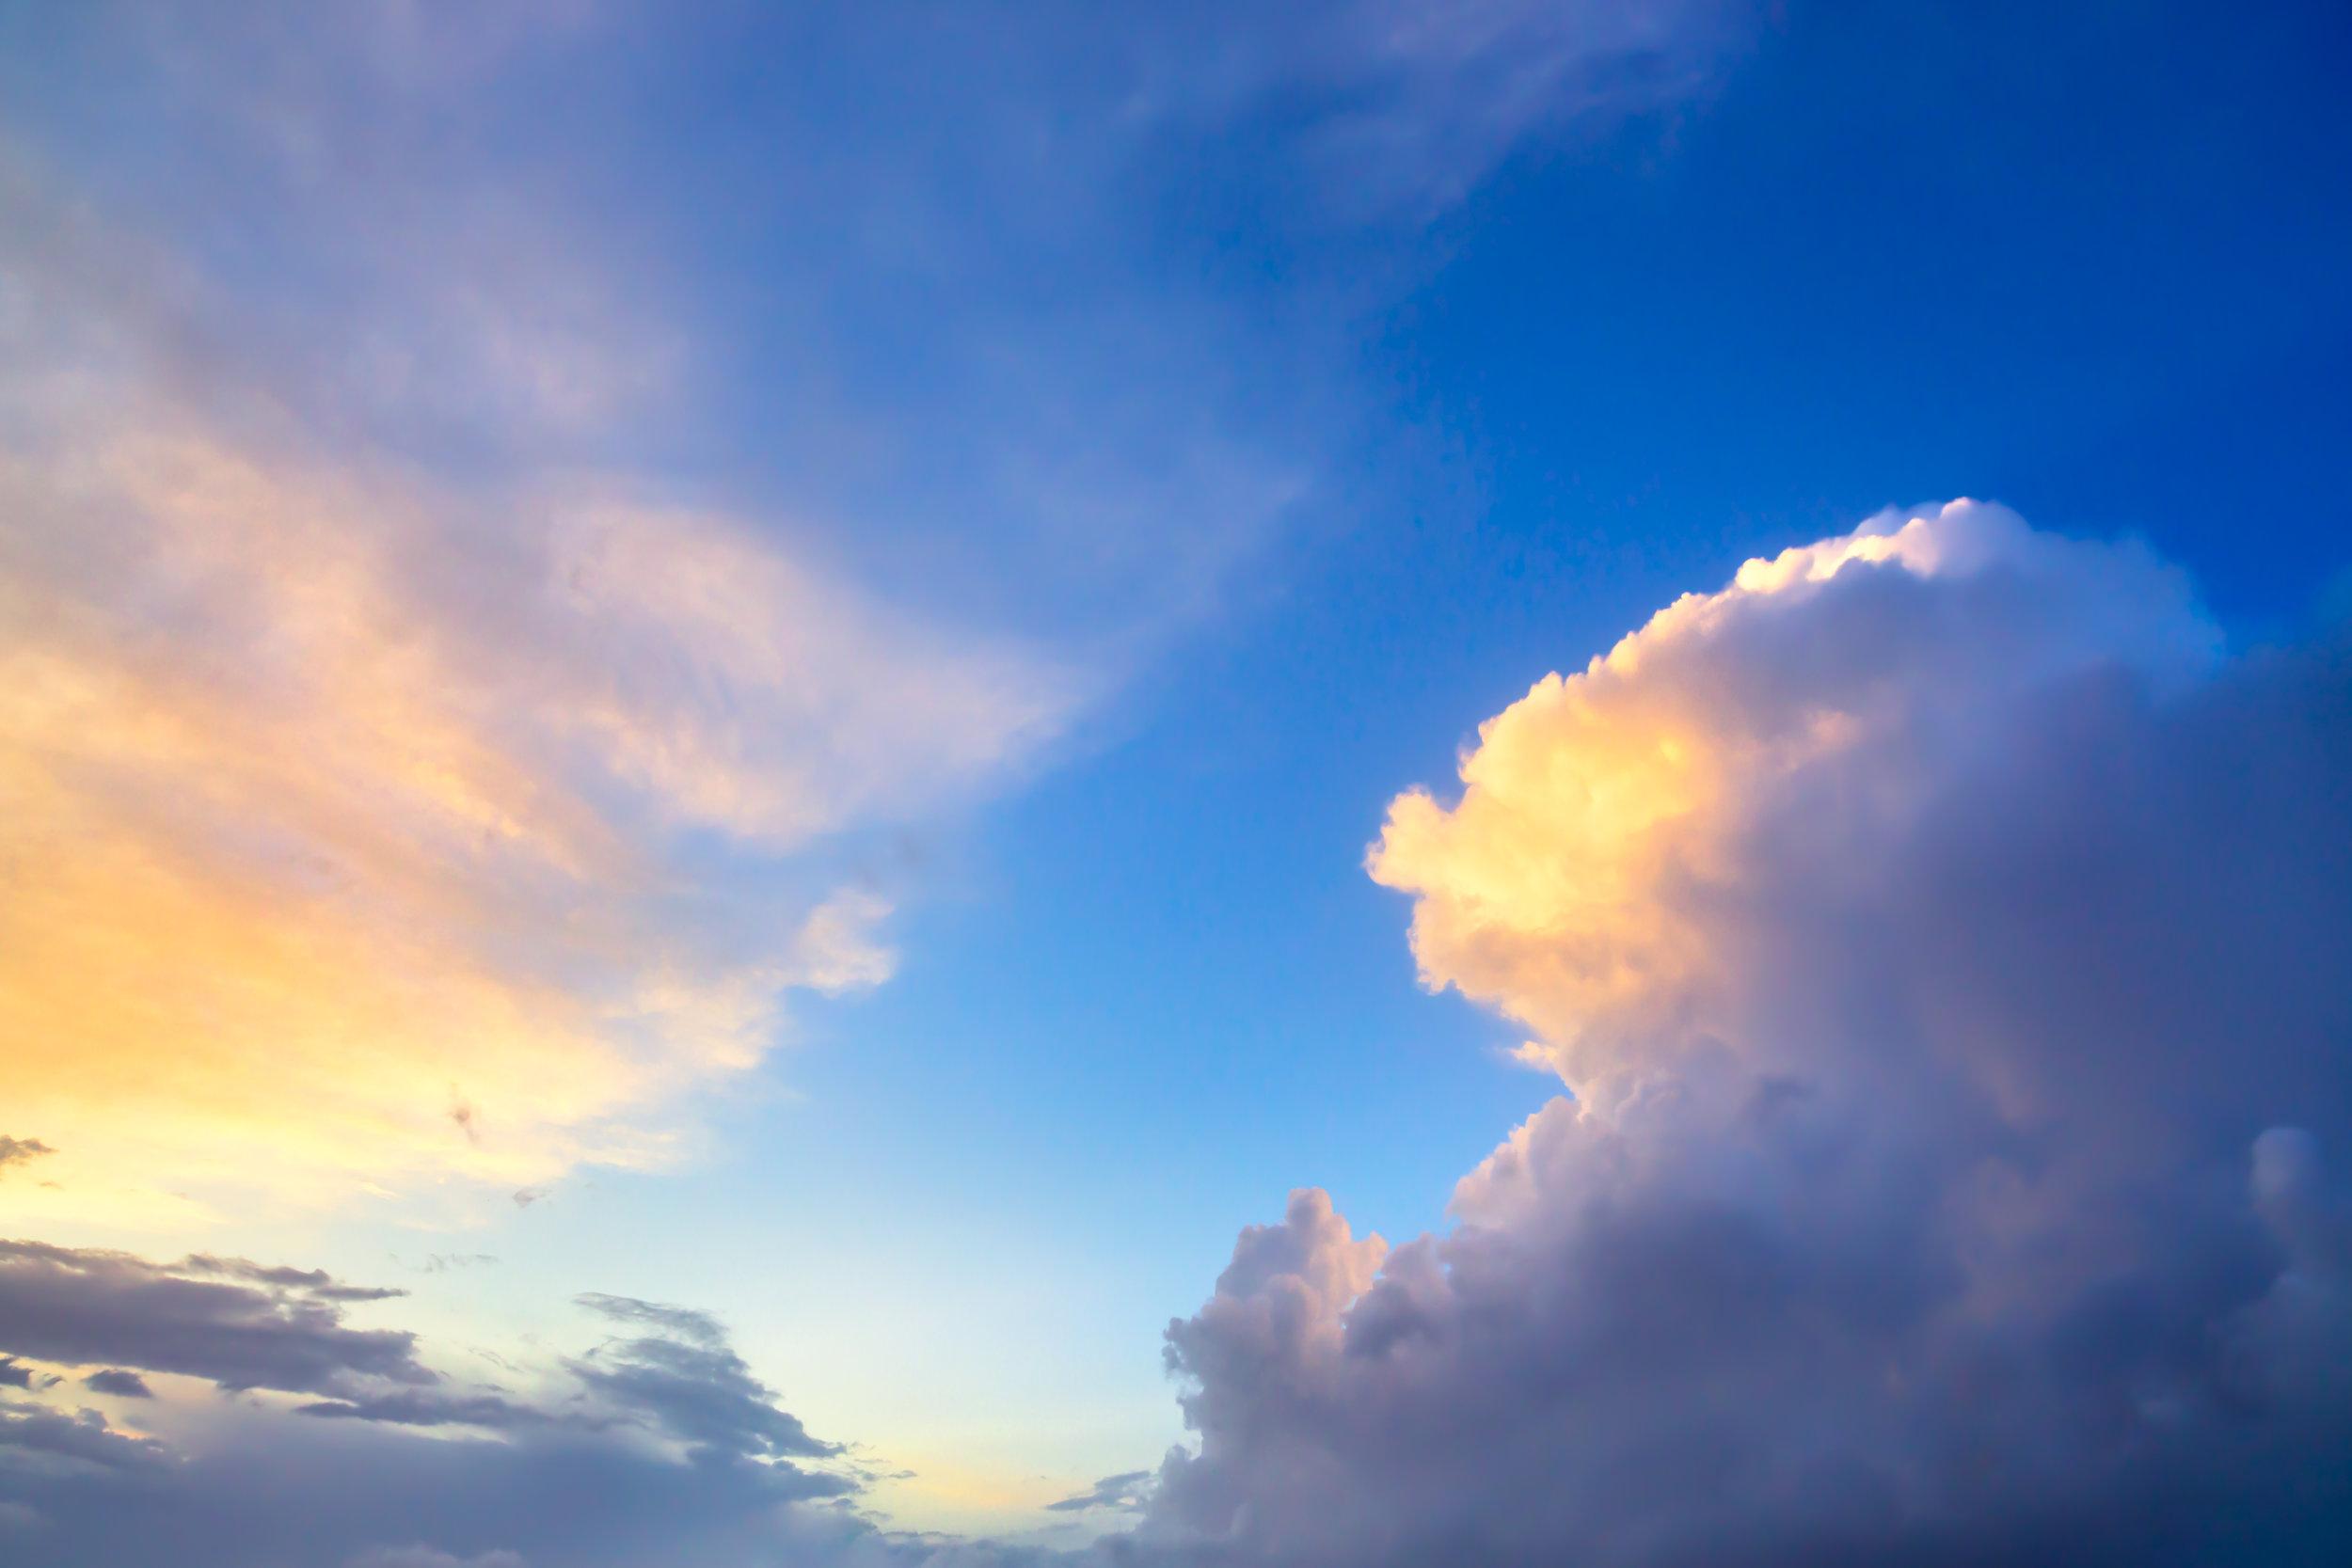 dramatic-sunset-sky-approaching-thunderstorm-PFJAD8P.jpg